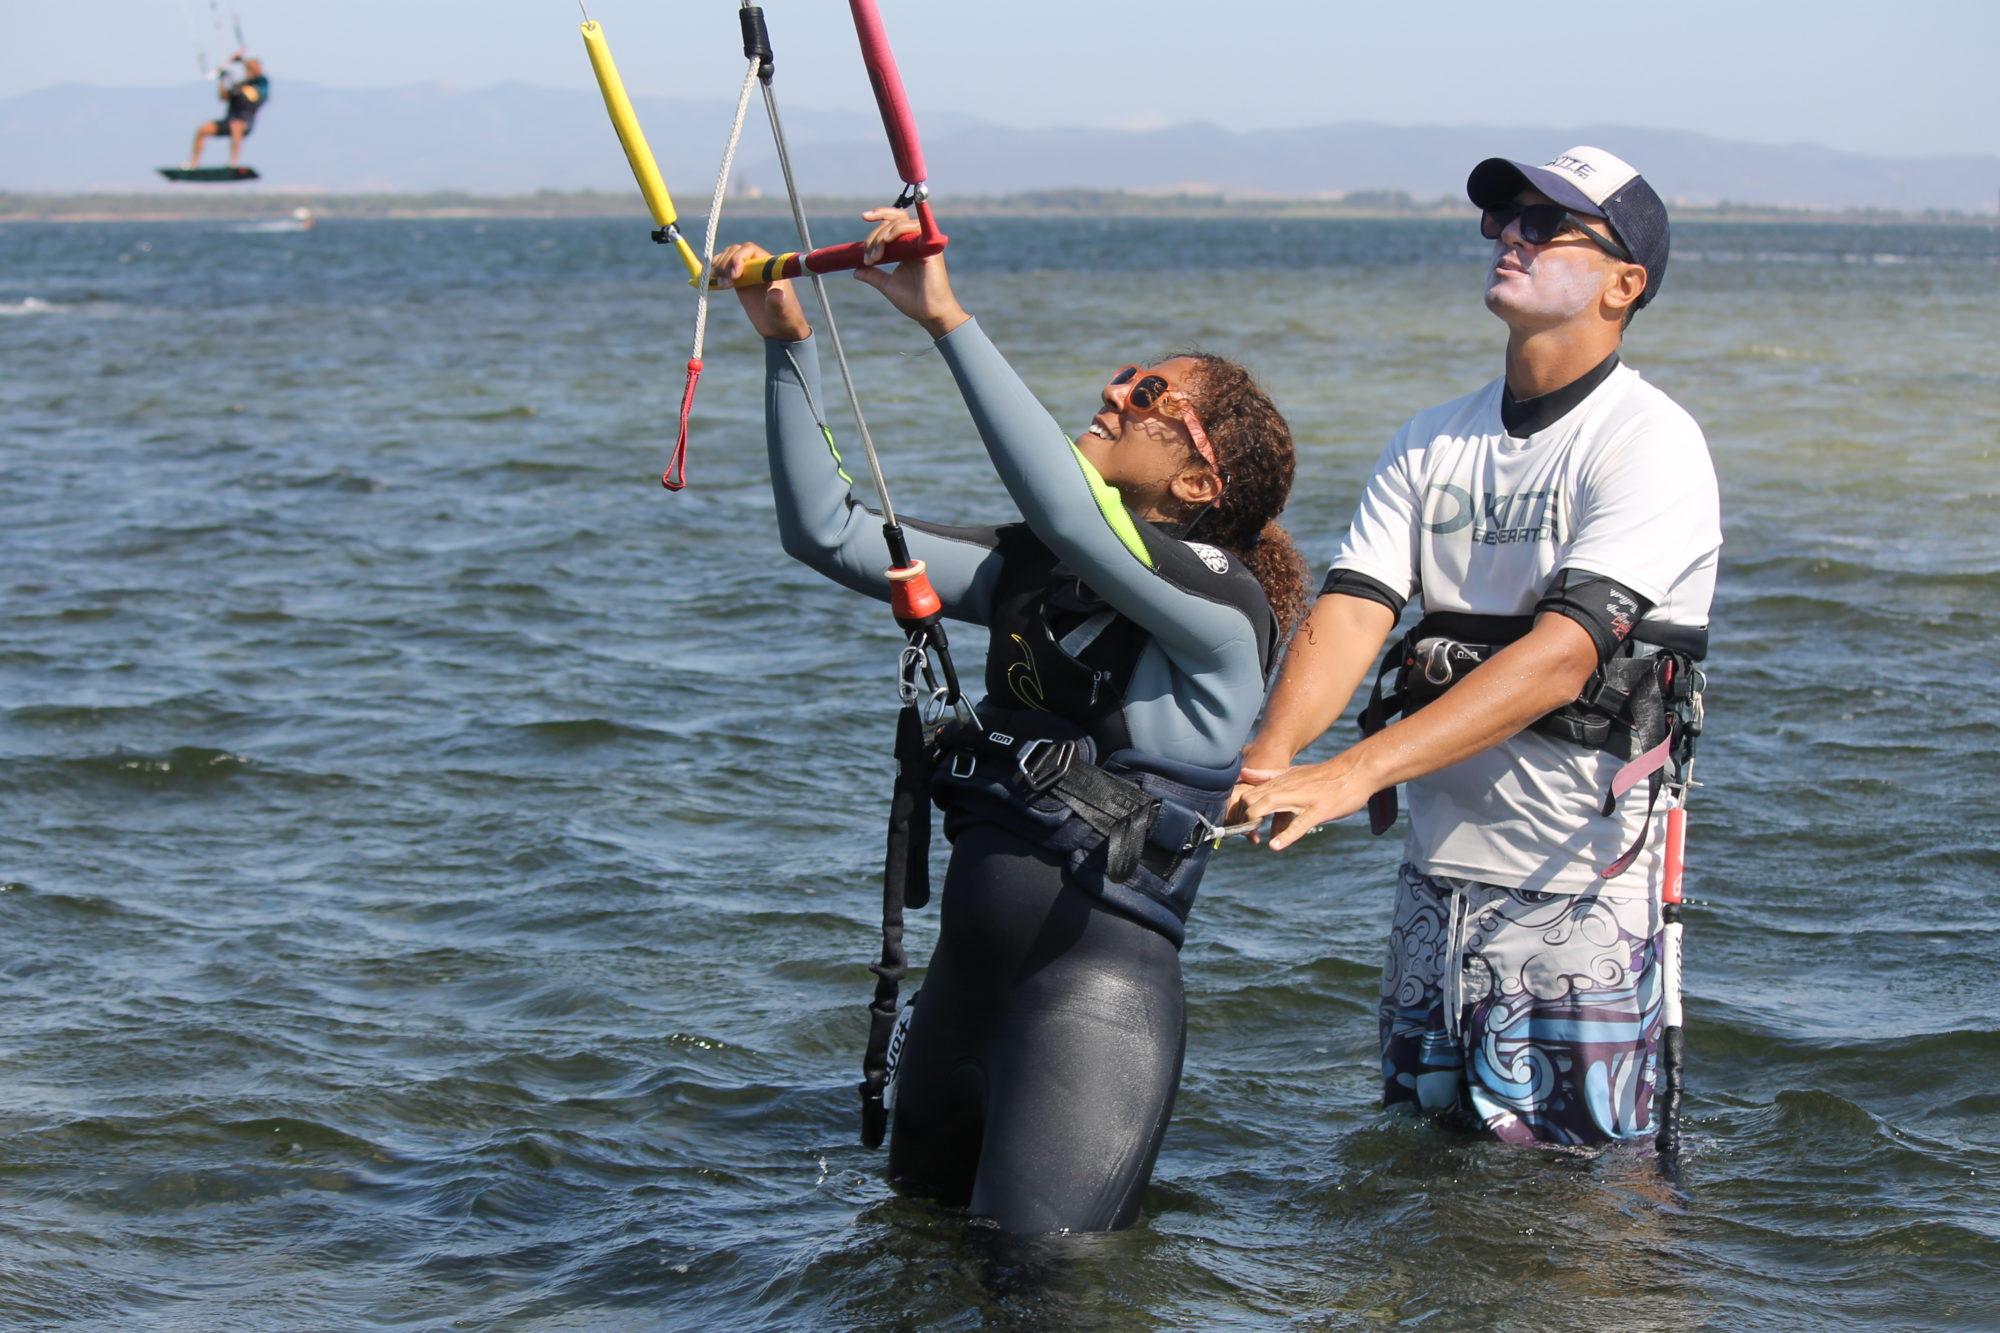 Punta Trettu Kitesurf School : Kite, Surf, SUP, Snorkeling in Punta Trettu, Sardinia